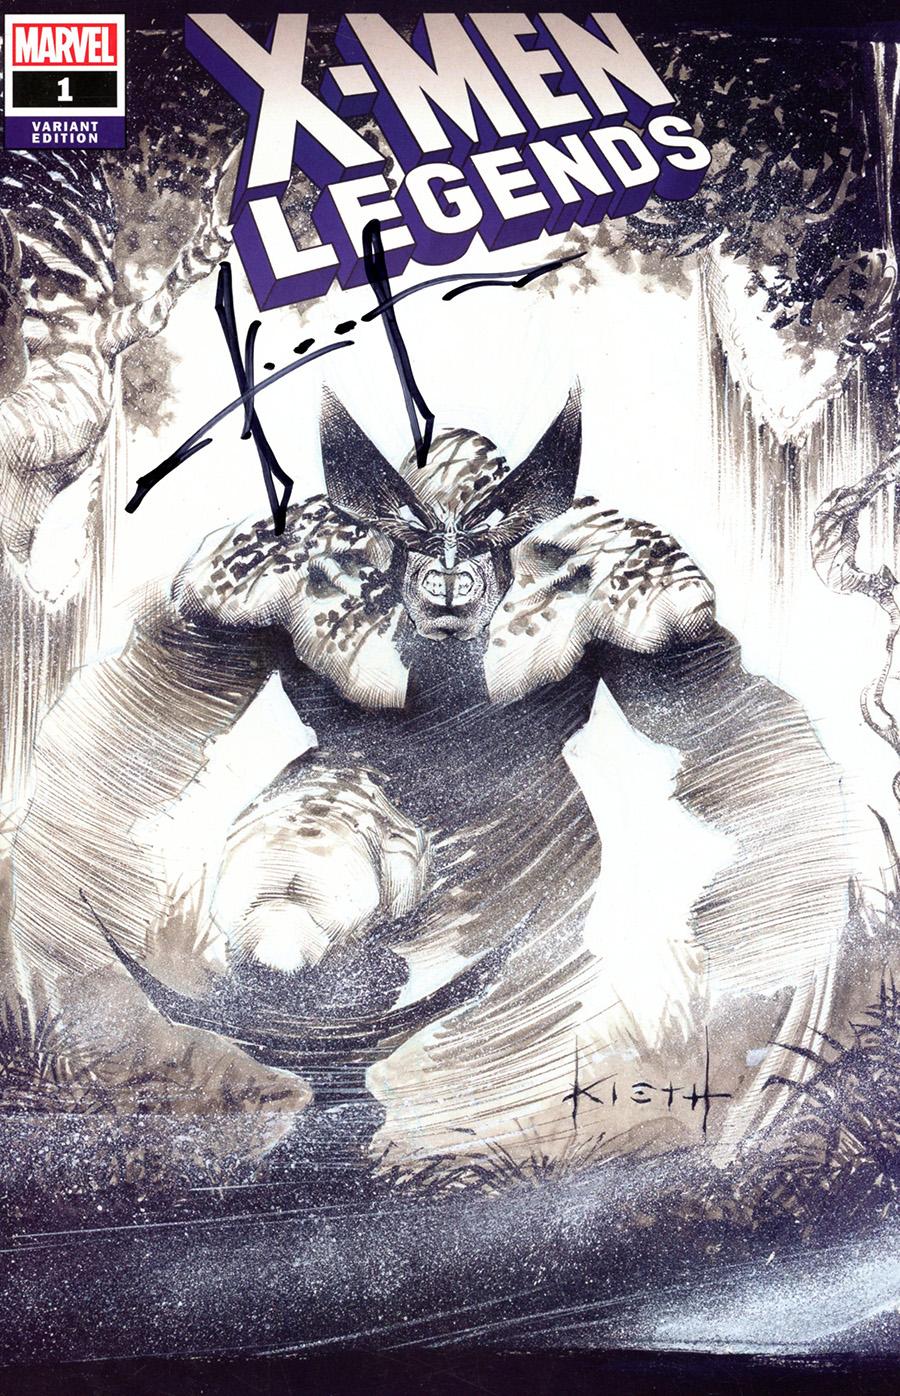 X-Men Legends #1 Cover H Clover Press Exclusive Sam Kieth Variant Cover Signed By Sam Kieth